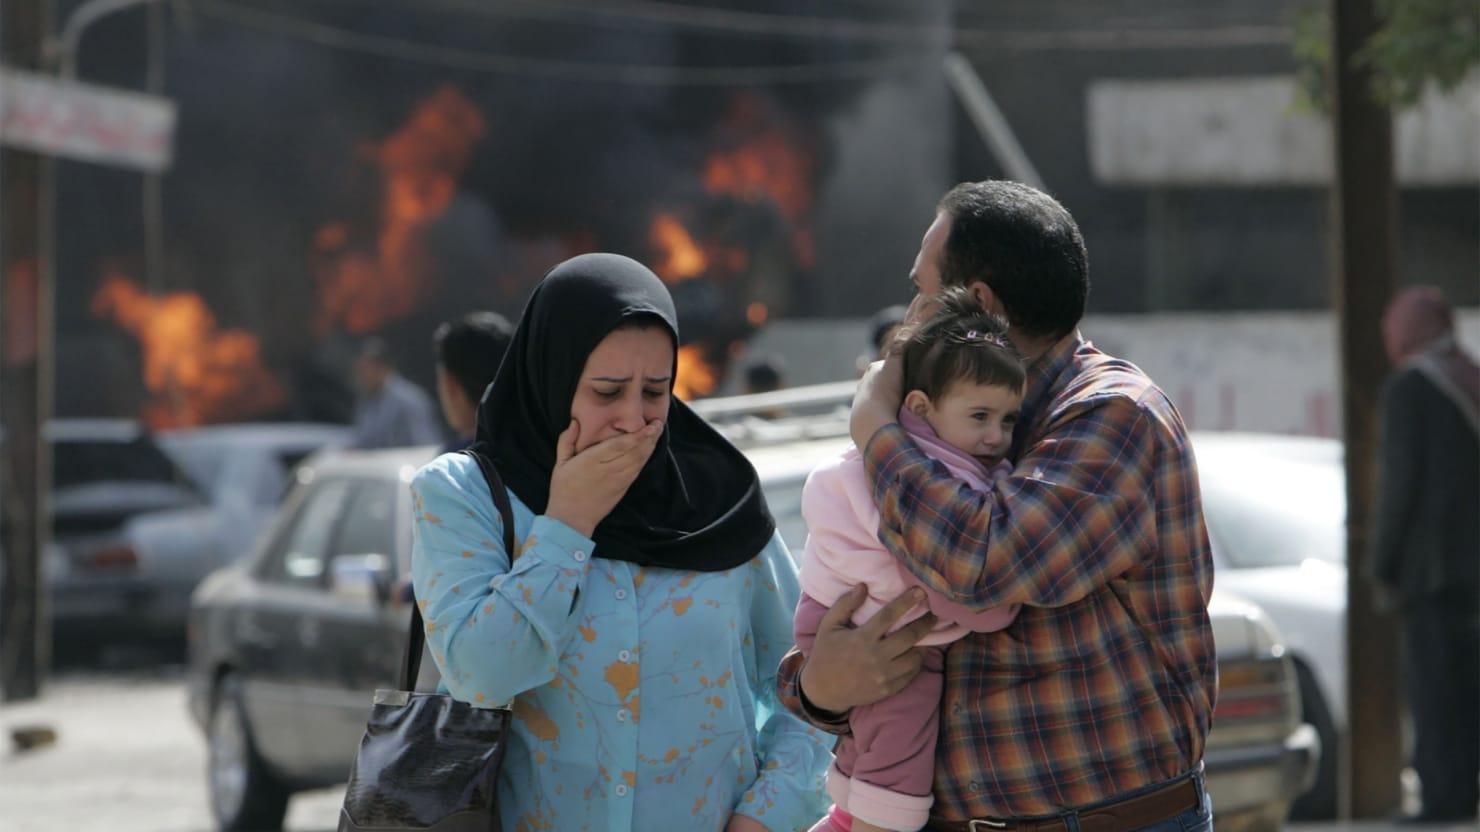 Pentagon Ready to Pay for the Iraqi Civilians It Kills. Next Step: Admit It Kills Civilians.